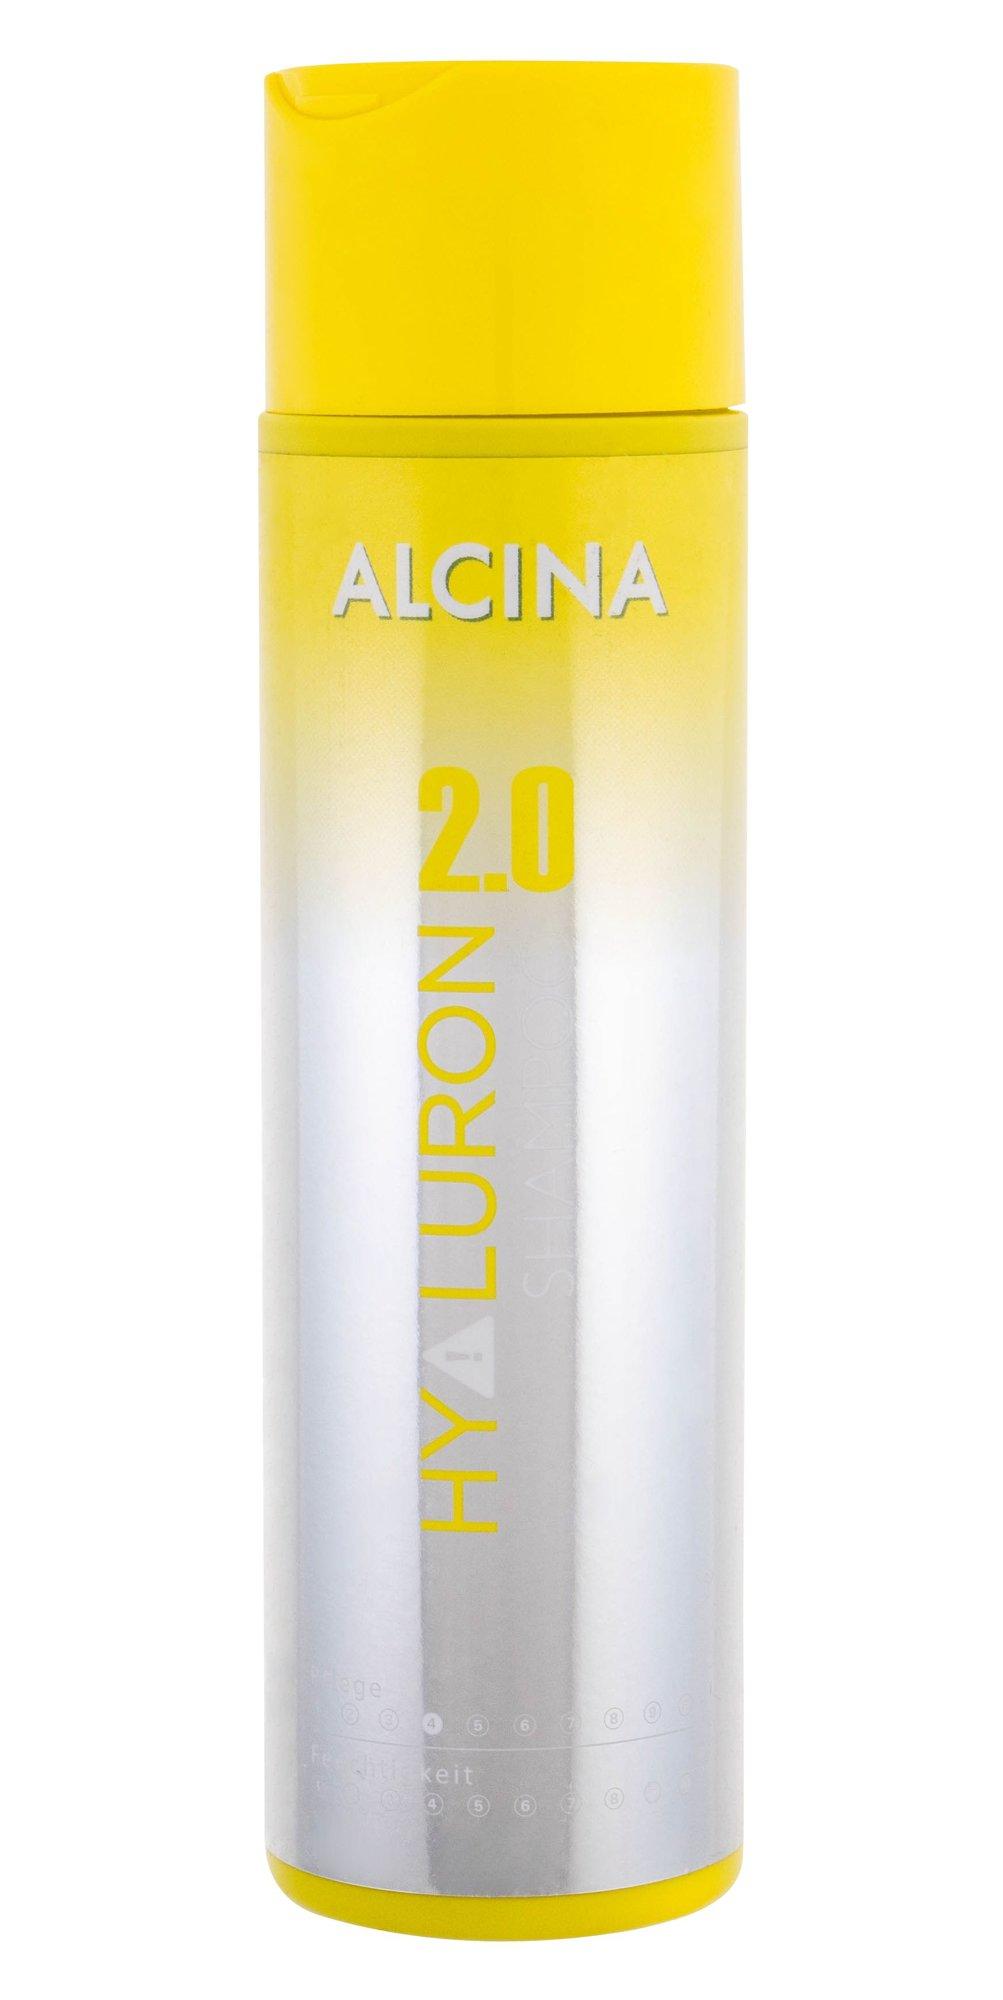 ALCINA Hyaluron 2.0 Shampoo 250ml